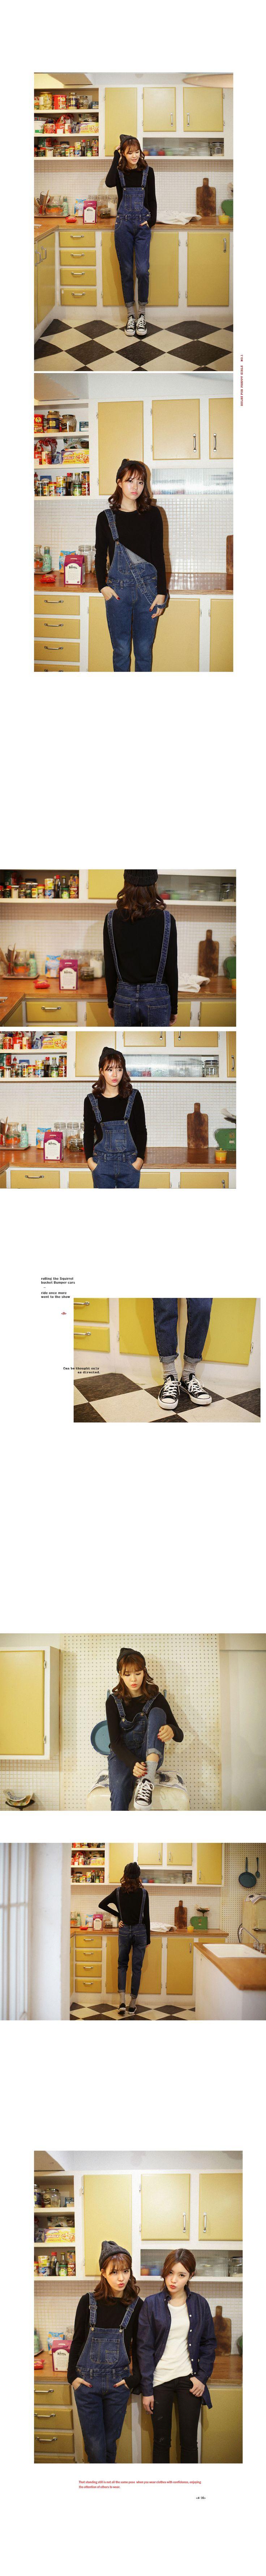 2TYPEバギーフィットオーバーオール・全2色デニム・ジーンズデニム・ジーンズ|レディースファッション通販 DHOLICディーホリック [ファストファッション 水着 ワンピース]